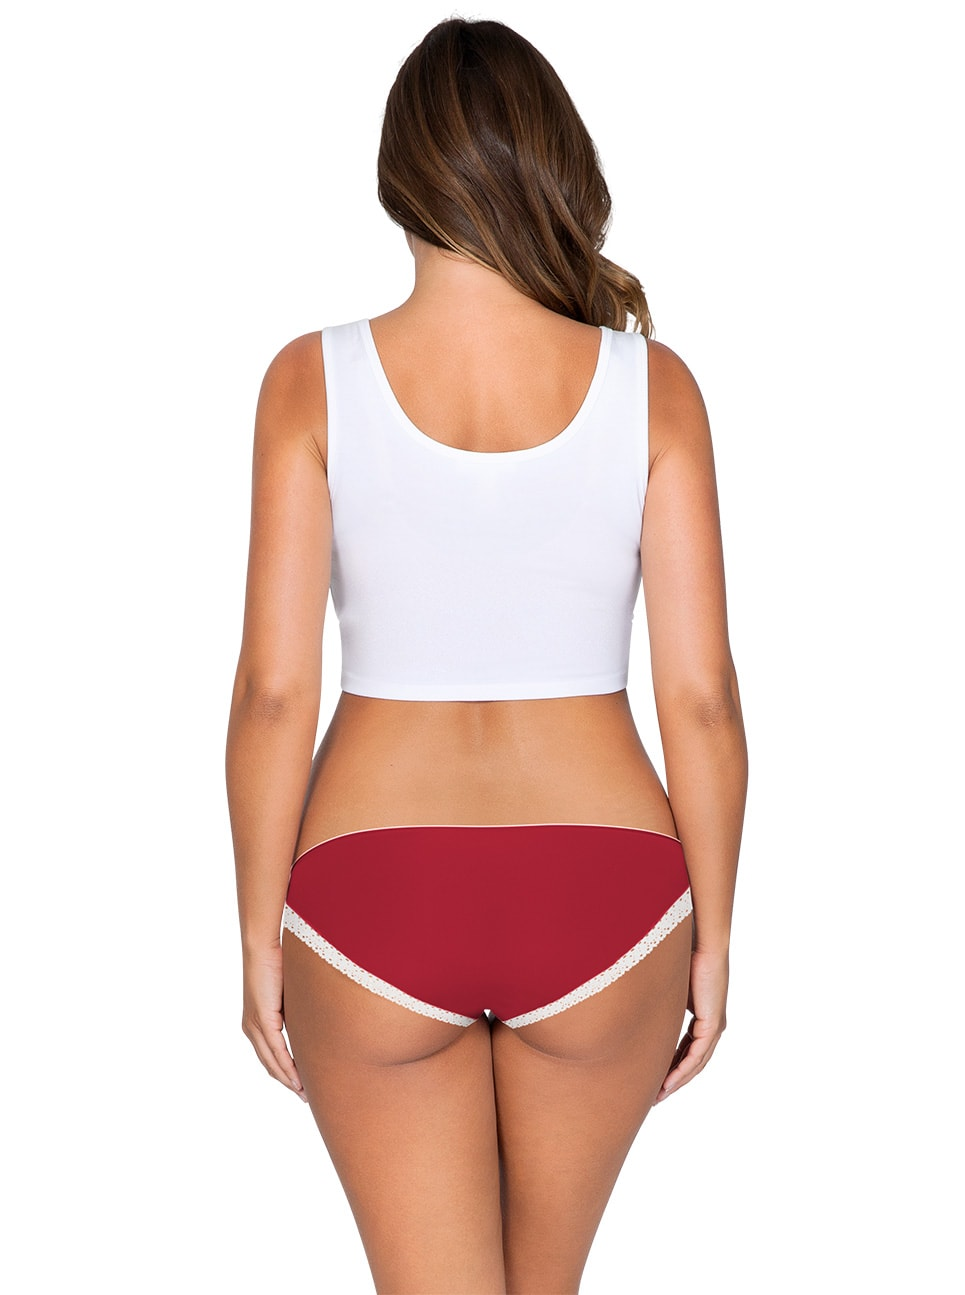 ParfaitPantyBikini PP301 D TangoRedBack - Panty So Lovely Bikini Tango Red PP301